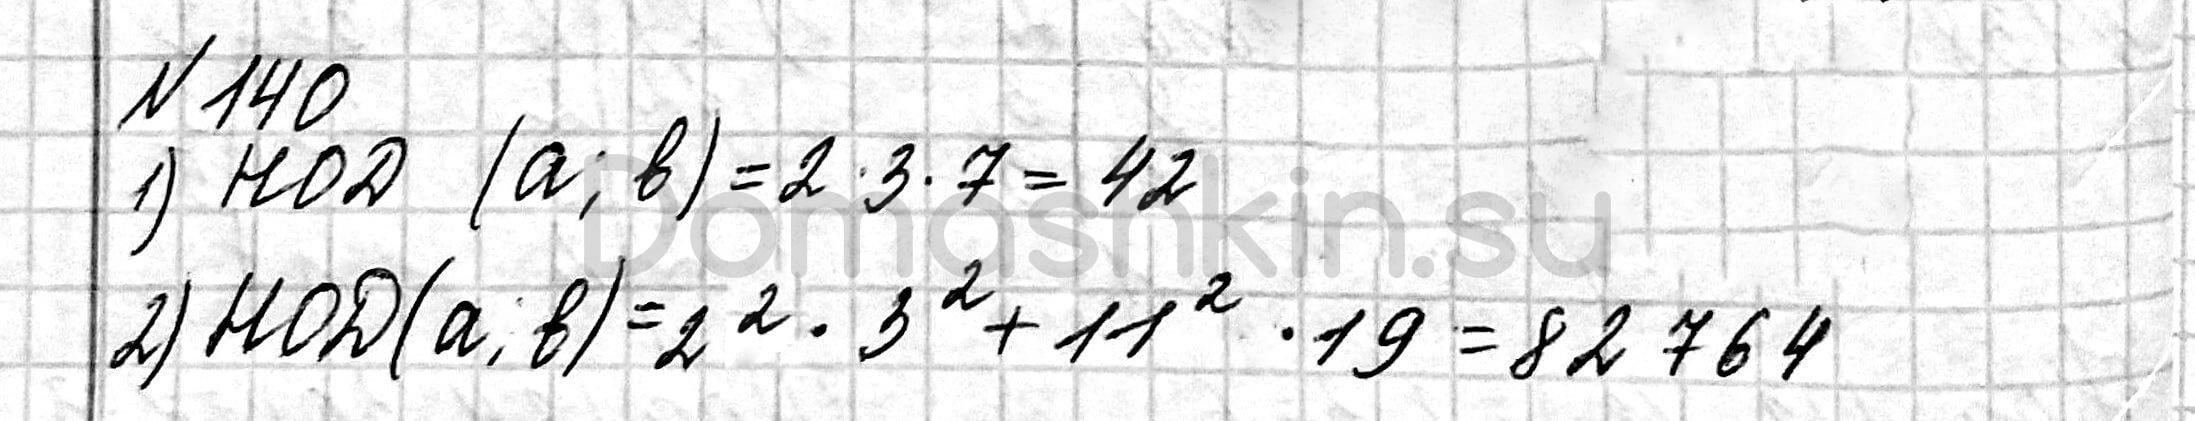 Математика 6 класс учебник Мерзляк номер 140 решение